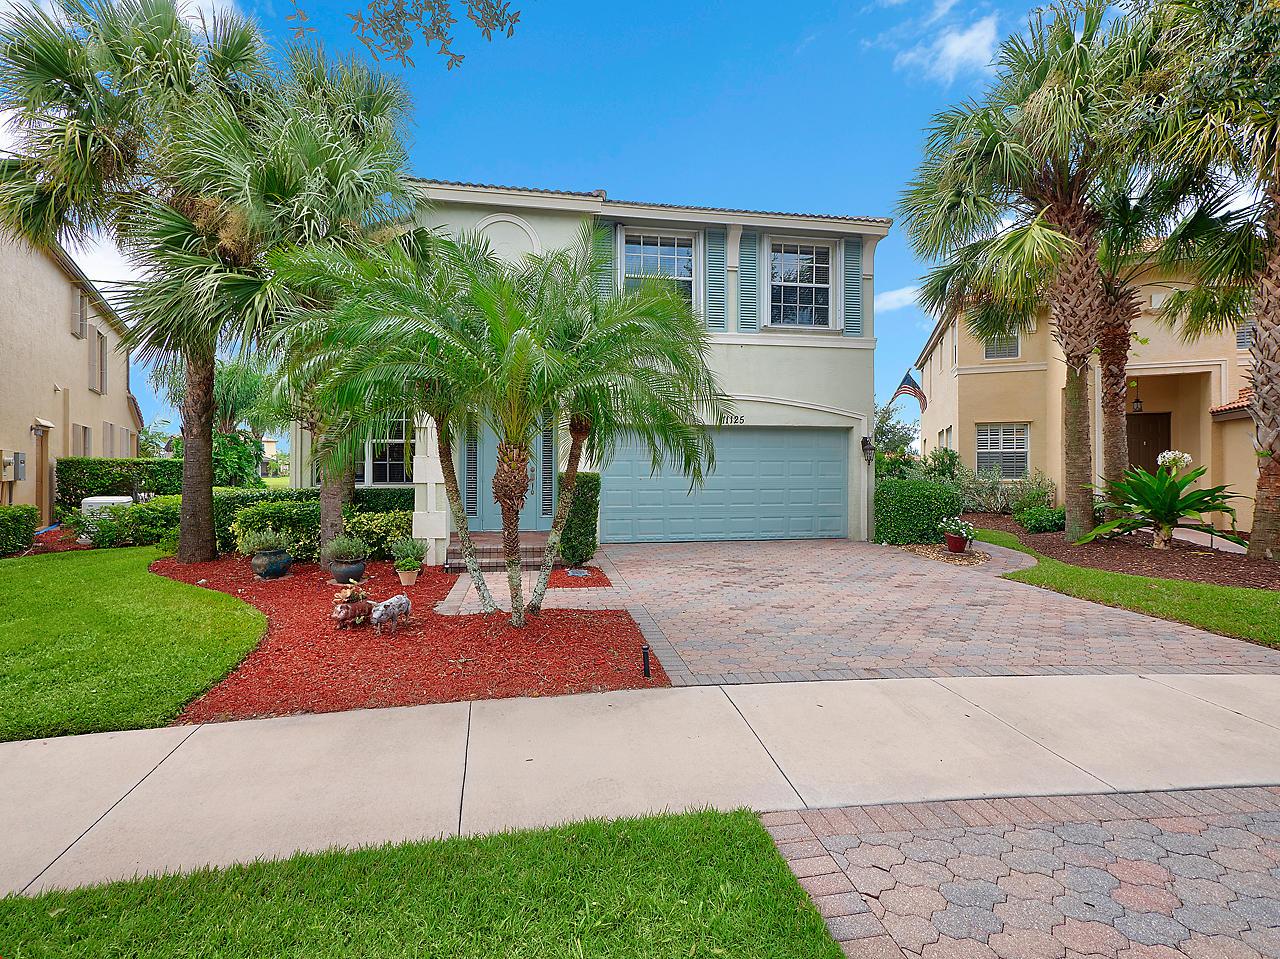 11125 SW Springtree Terrace - 34987 - FL - Port Saint Lucie